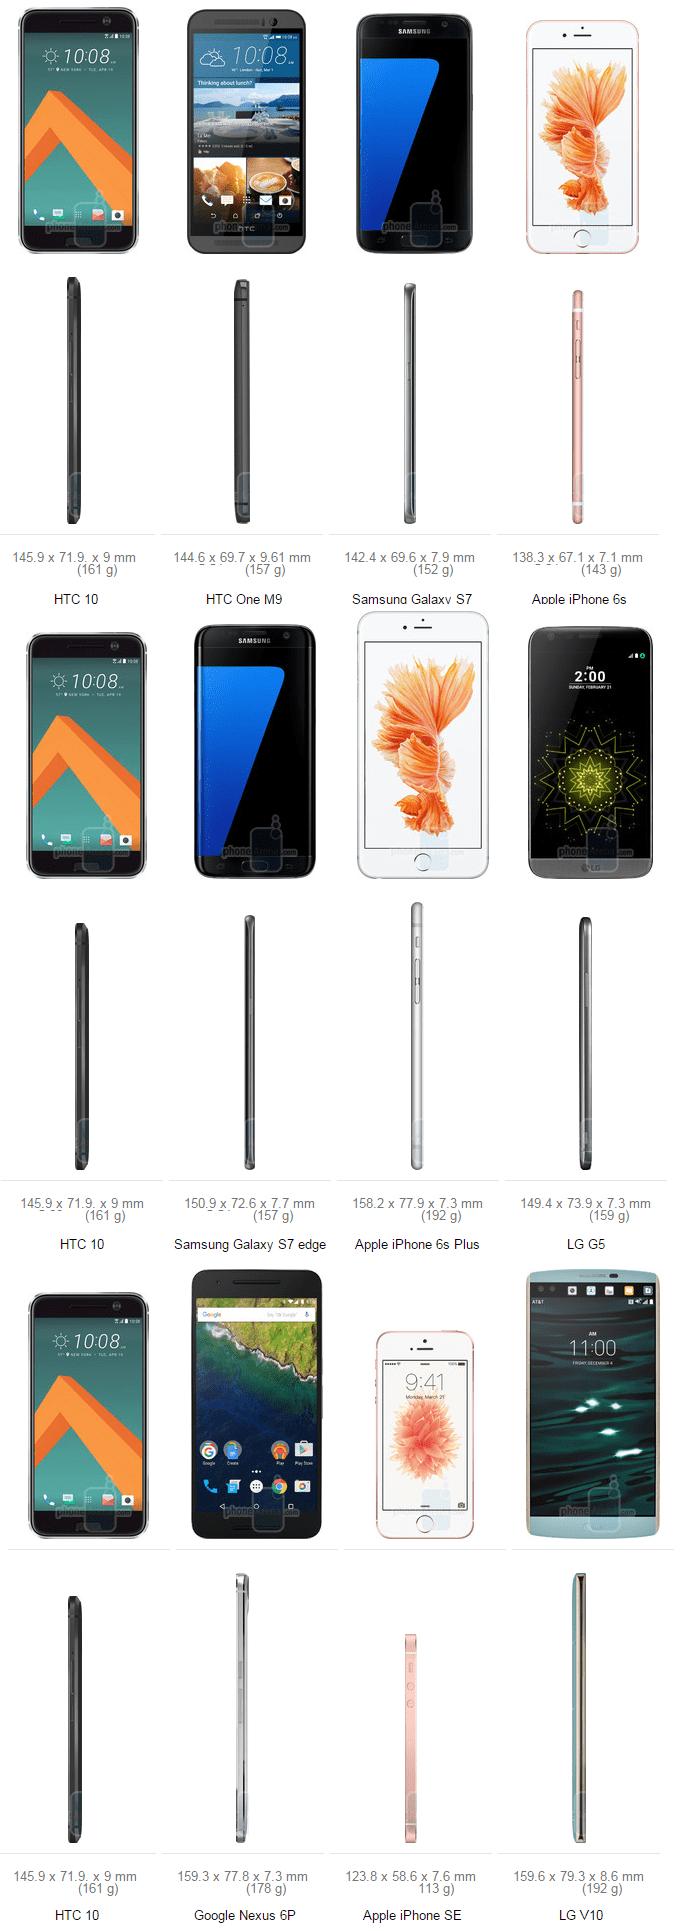 HTC 10 Size Comparsion